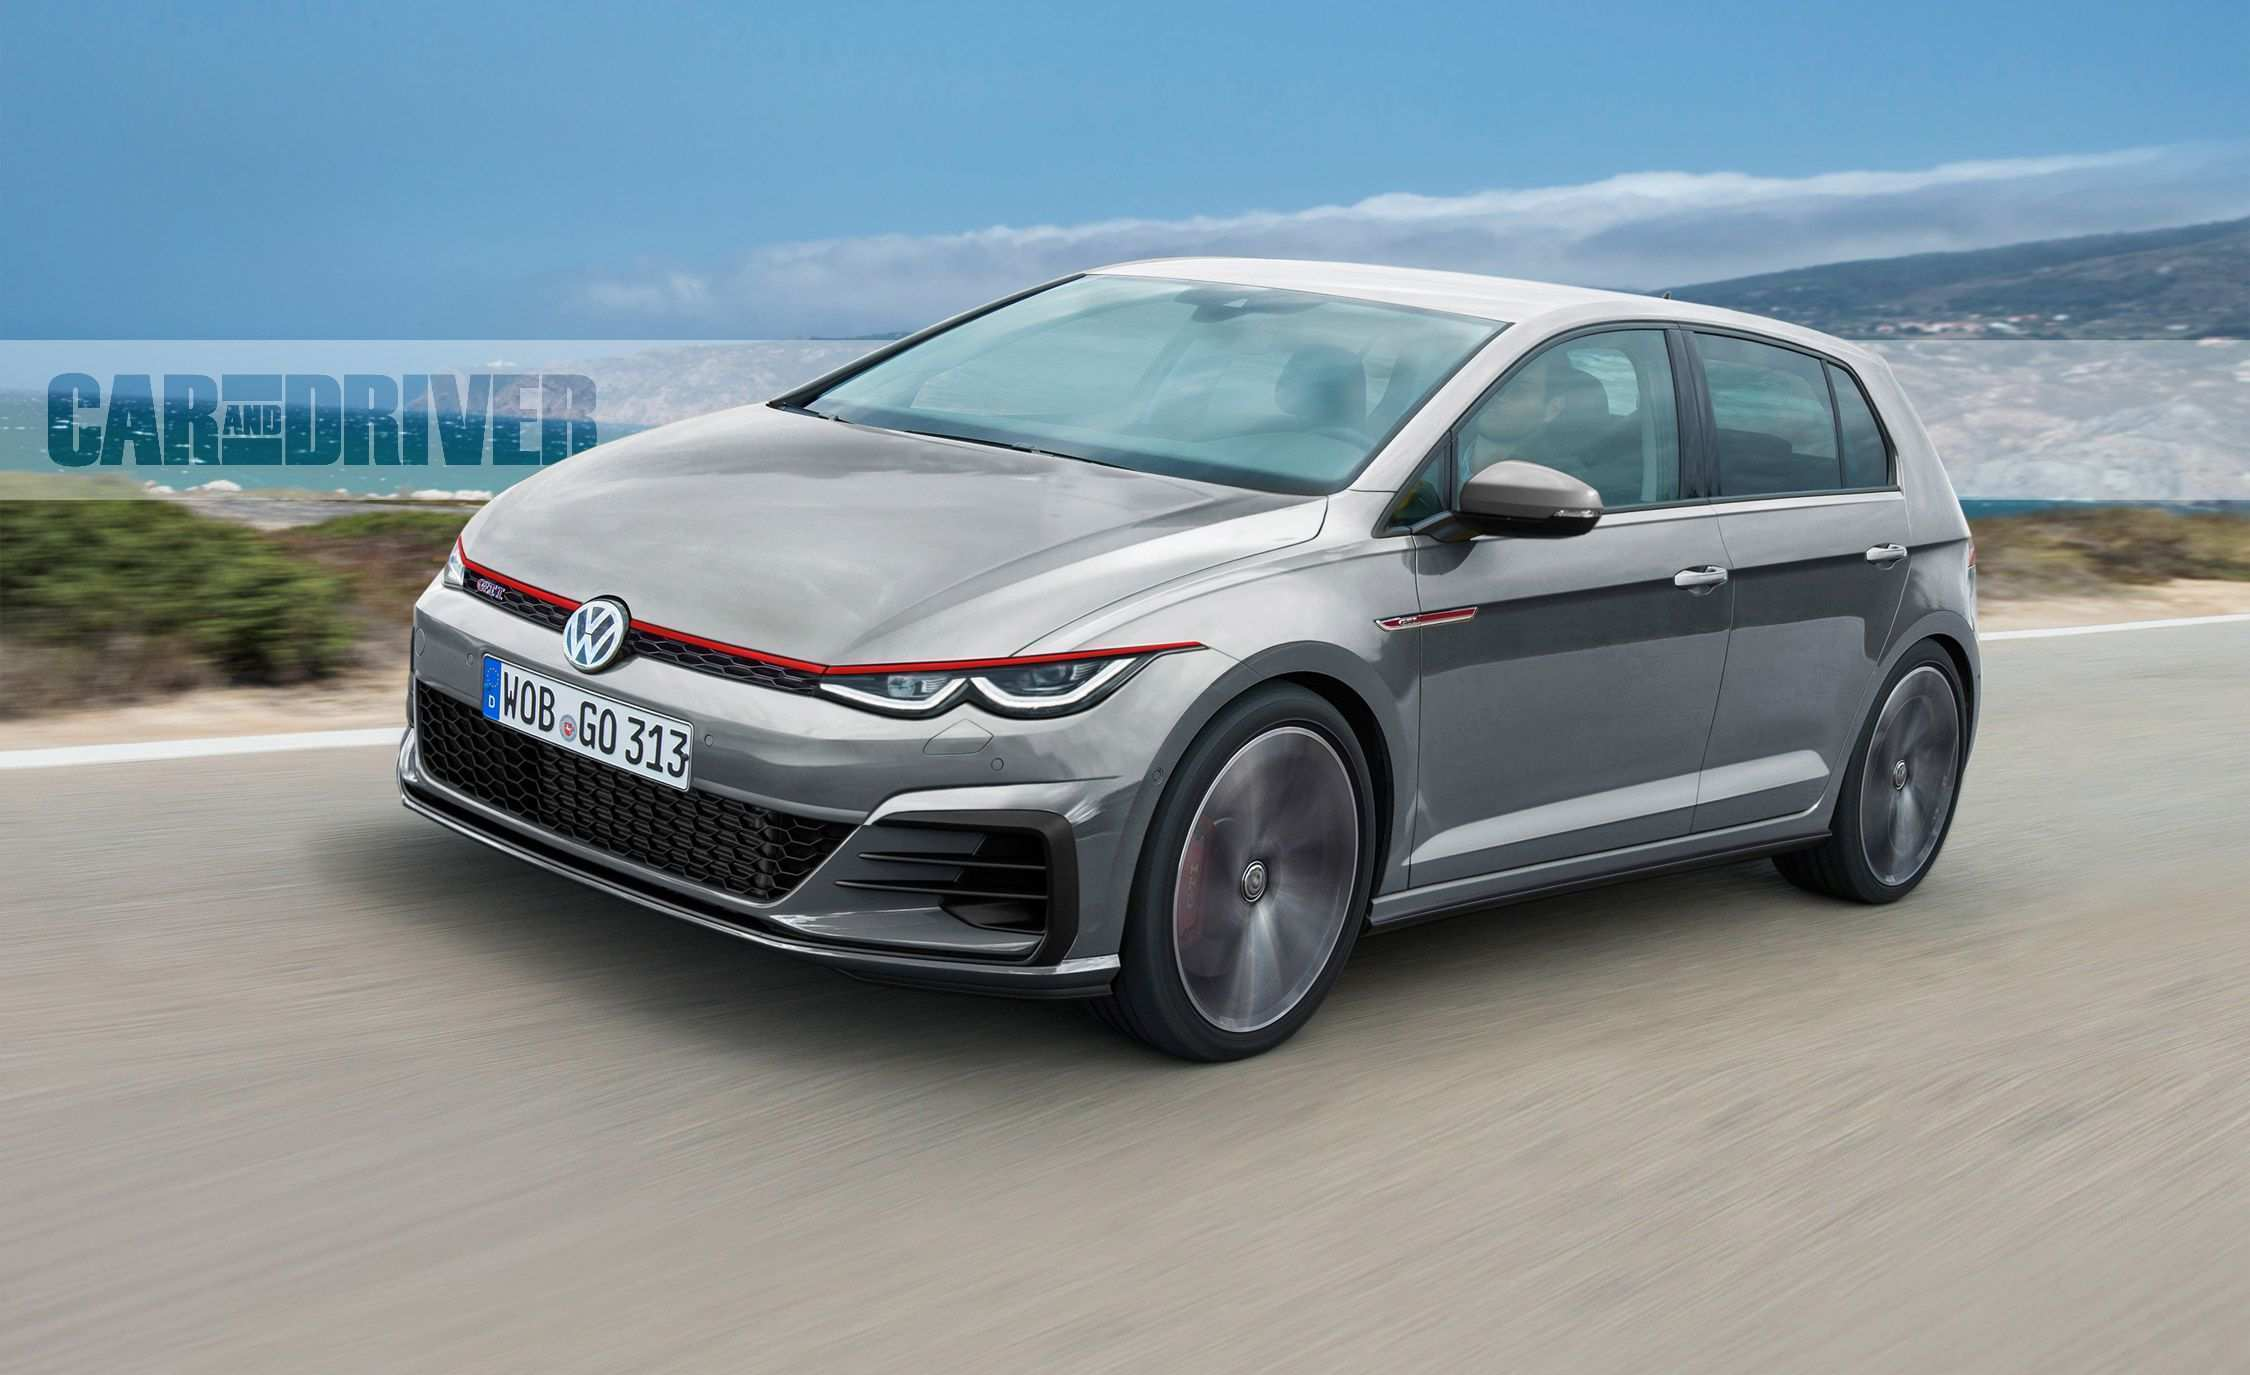 37 Gallery of 2020 Volkswagen Gti Reviews with 2020 Volkswagen Gti